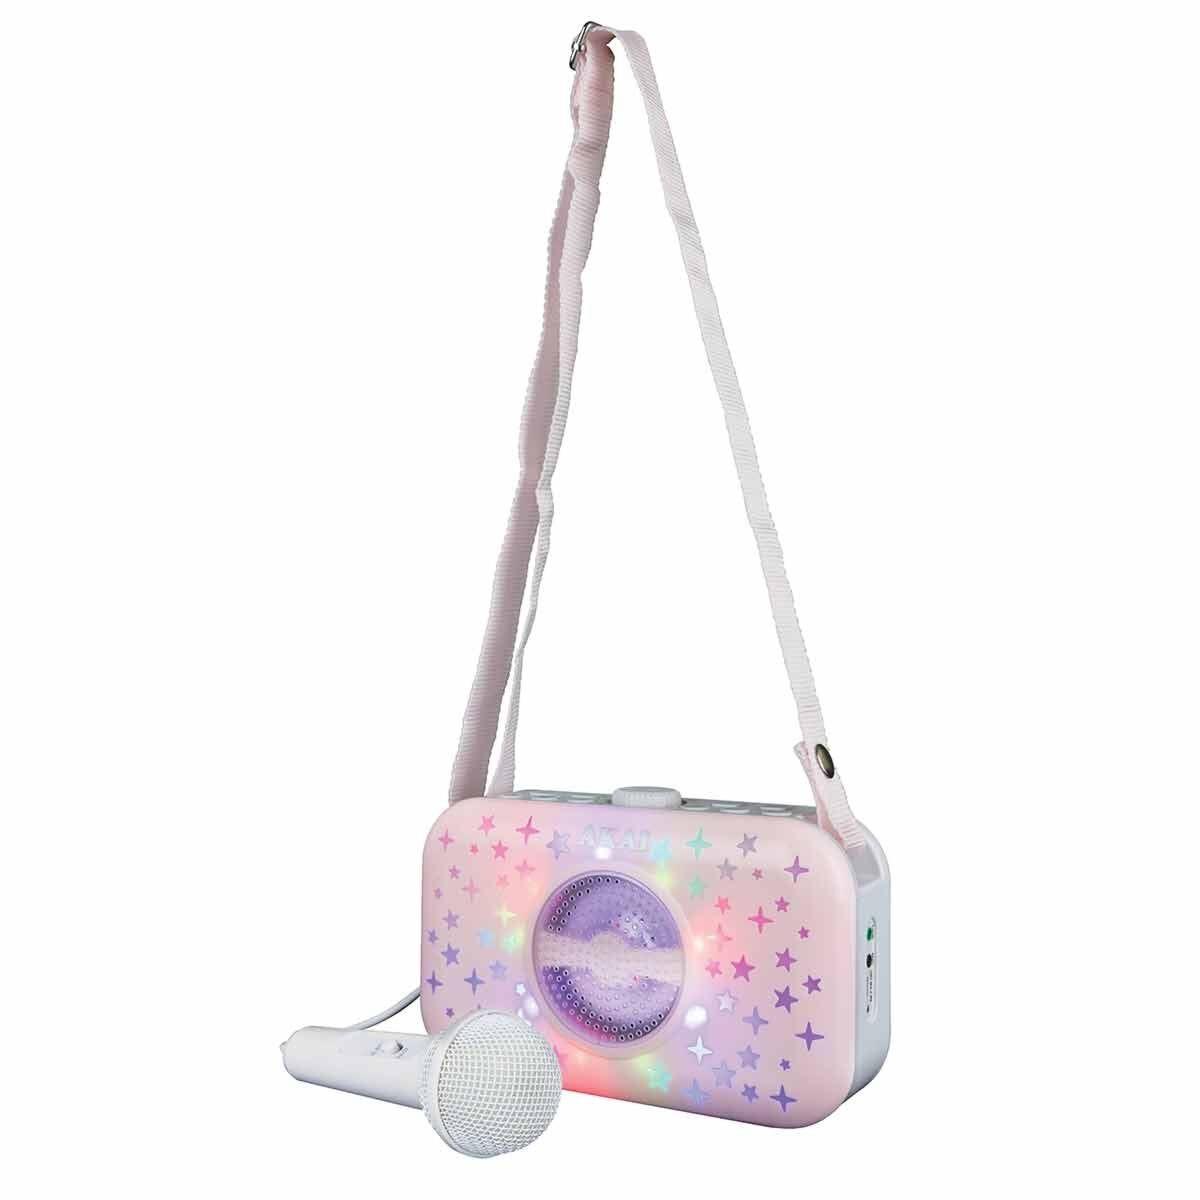 Akai Vibes LED Wireless Handbag Karaoke Speaker